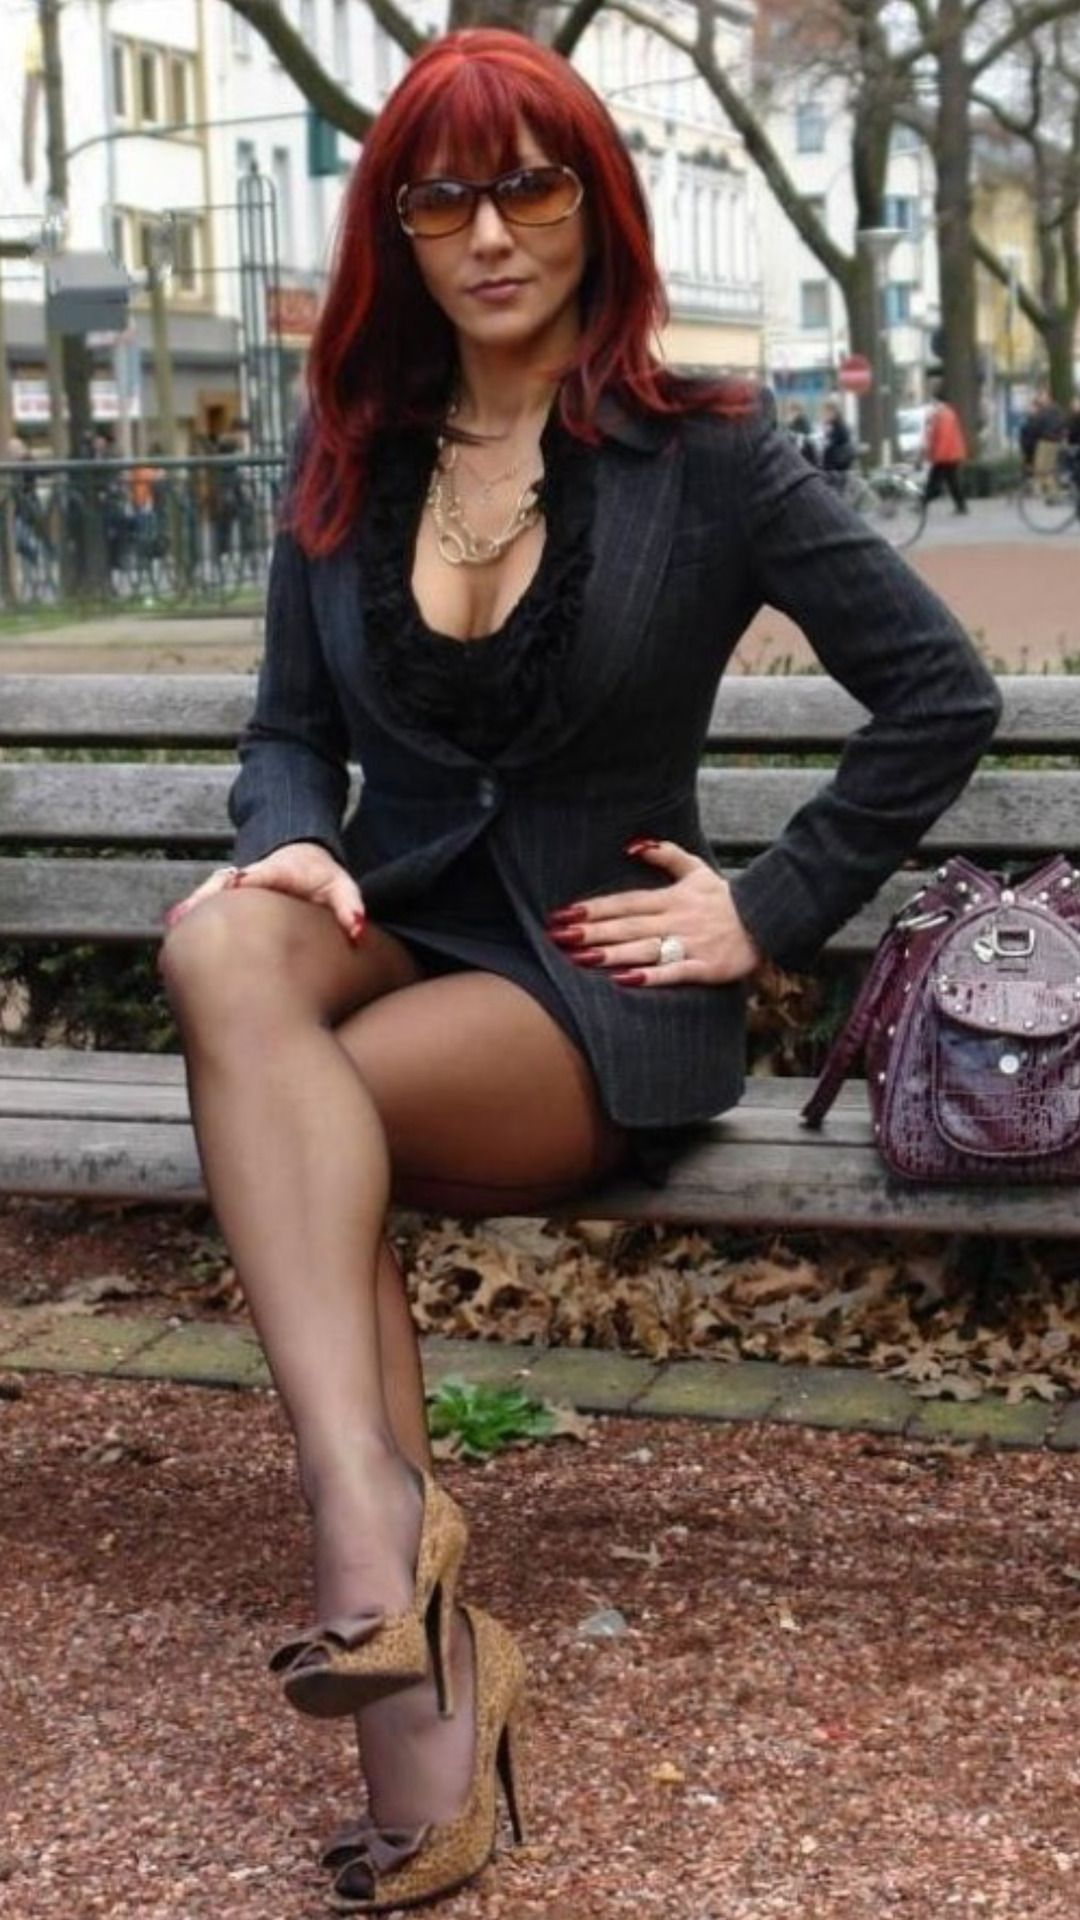 Beautiful Redhead Girl Posing In Straw Hat For Fashion